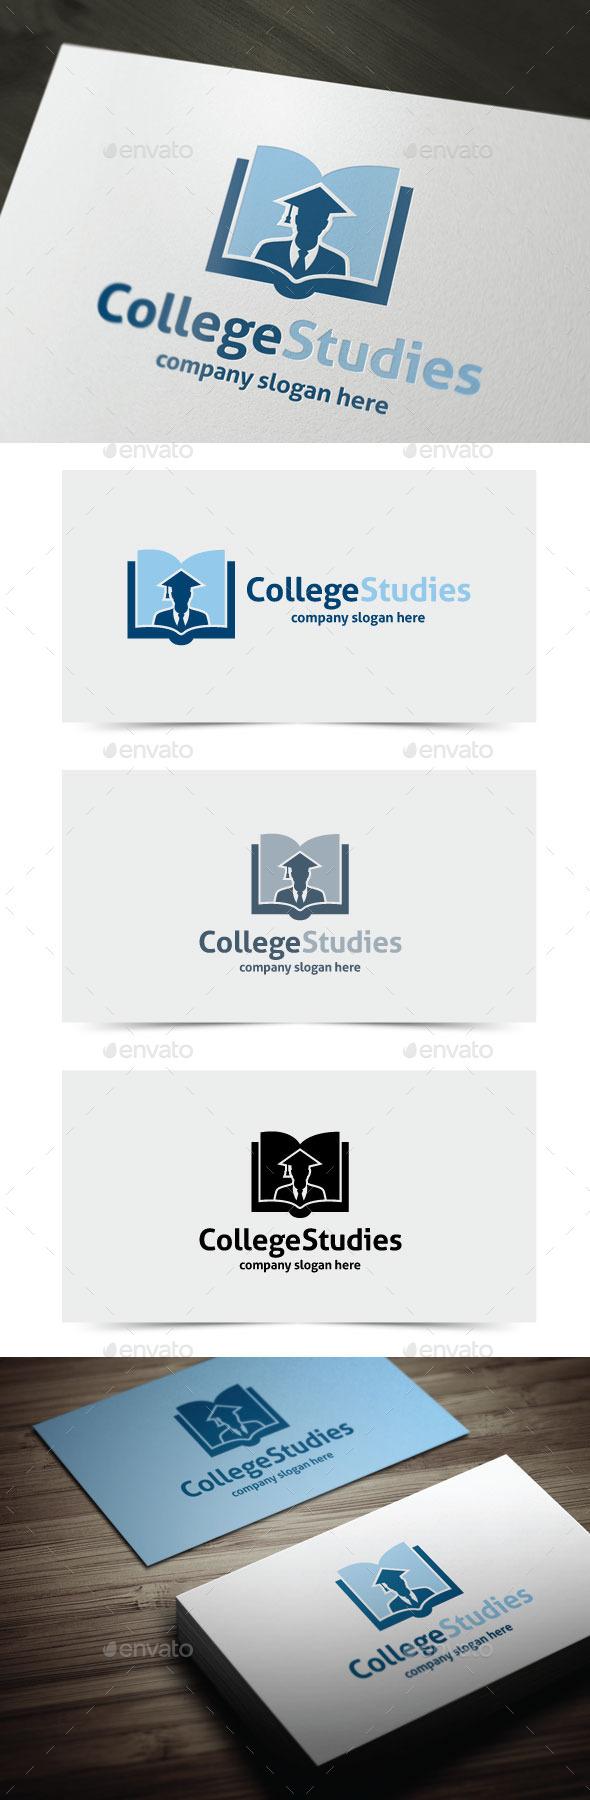 GraphicRiver College Studies 10769604